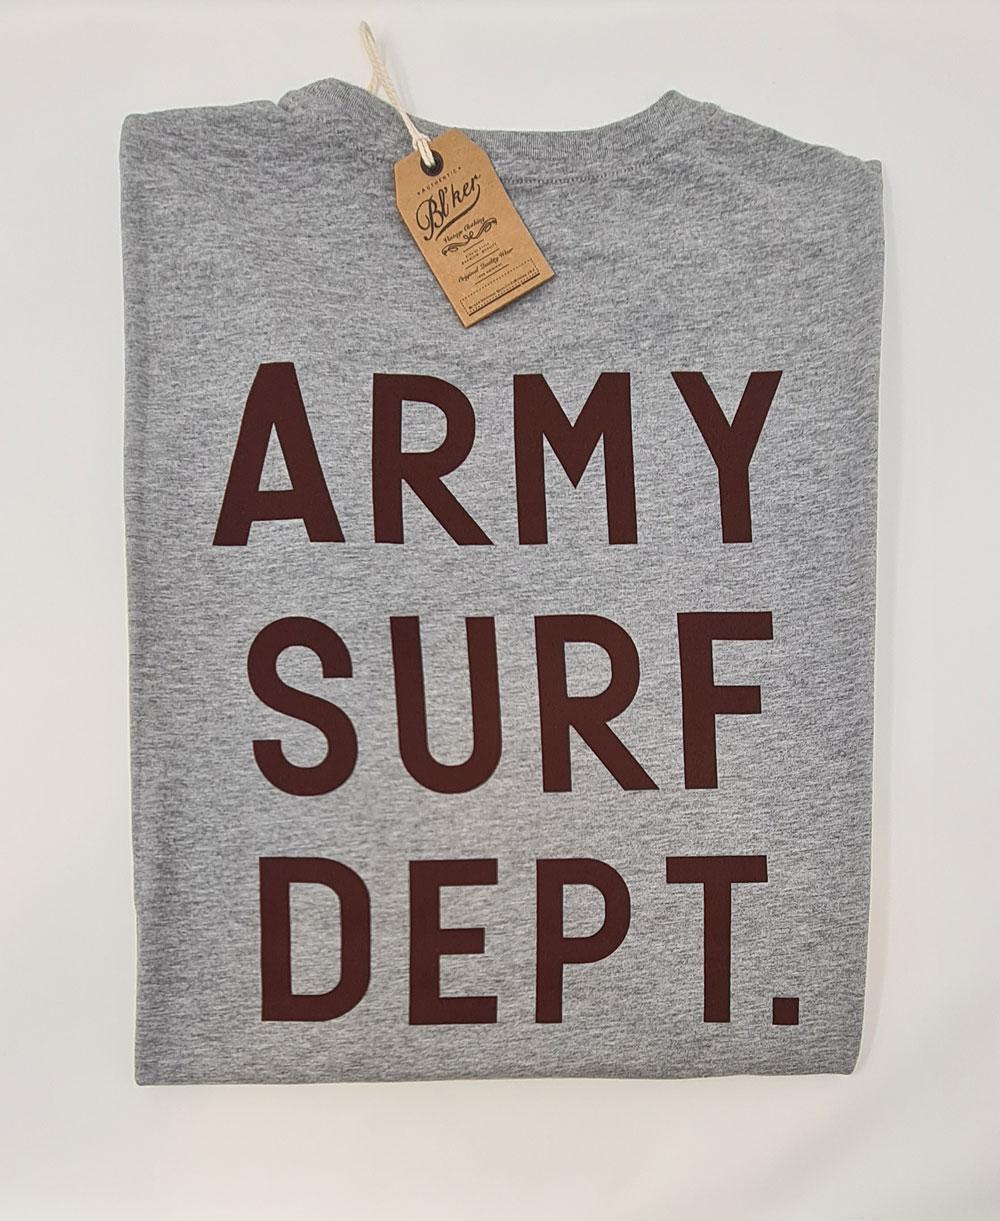 Army Surf Dept T-Shirt Manica Corta Uomo Heather Grey